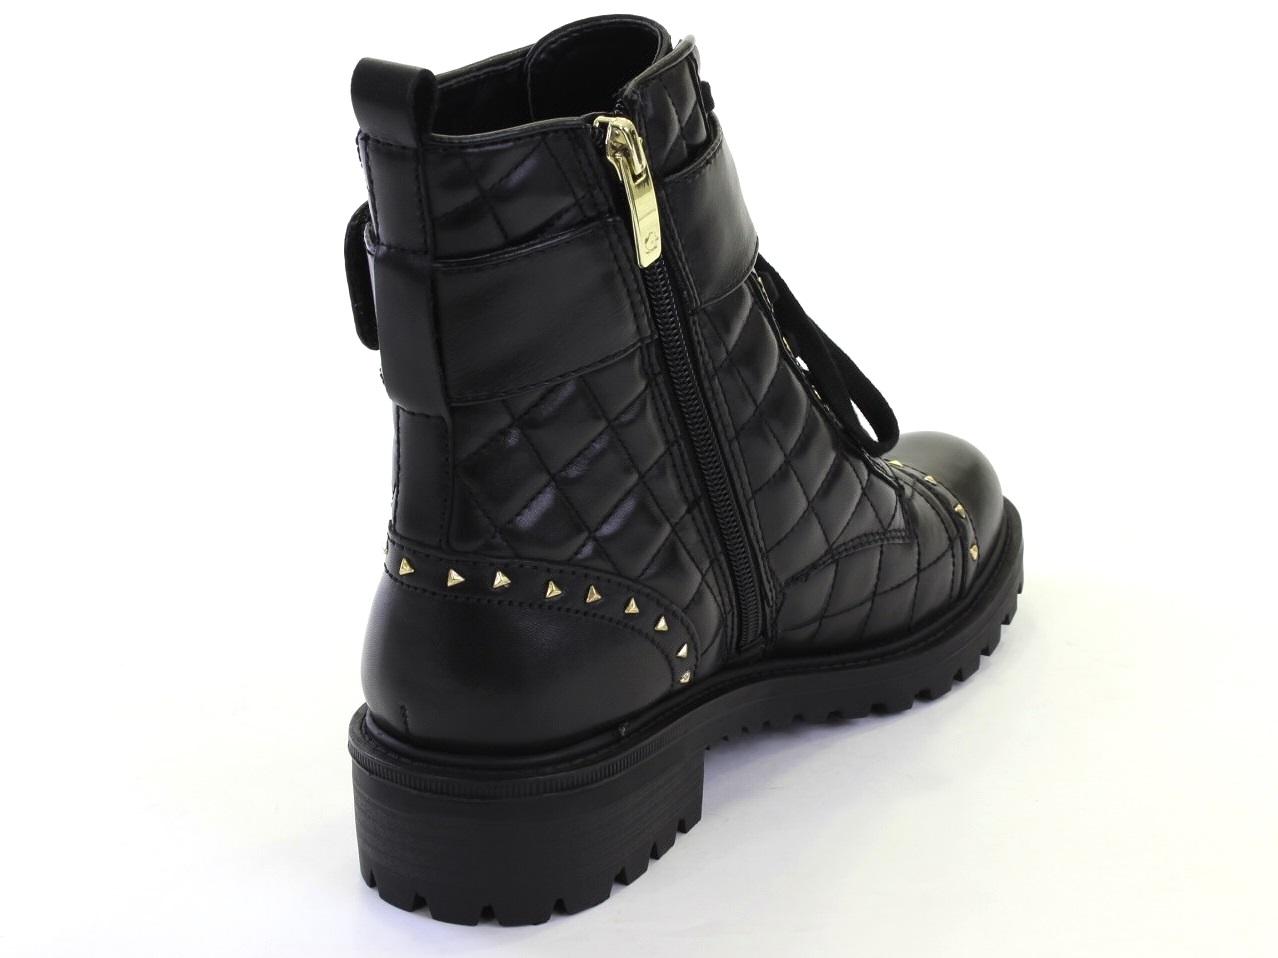 49e0b8e76d3a Flat Ankle Boots Guess - 465 FLHOY4 LEA10